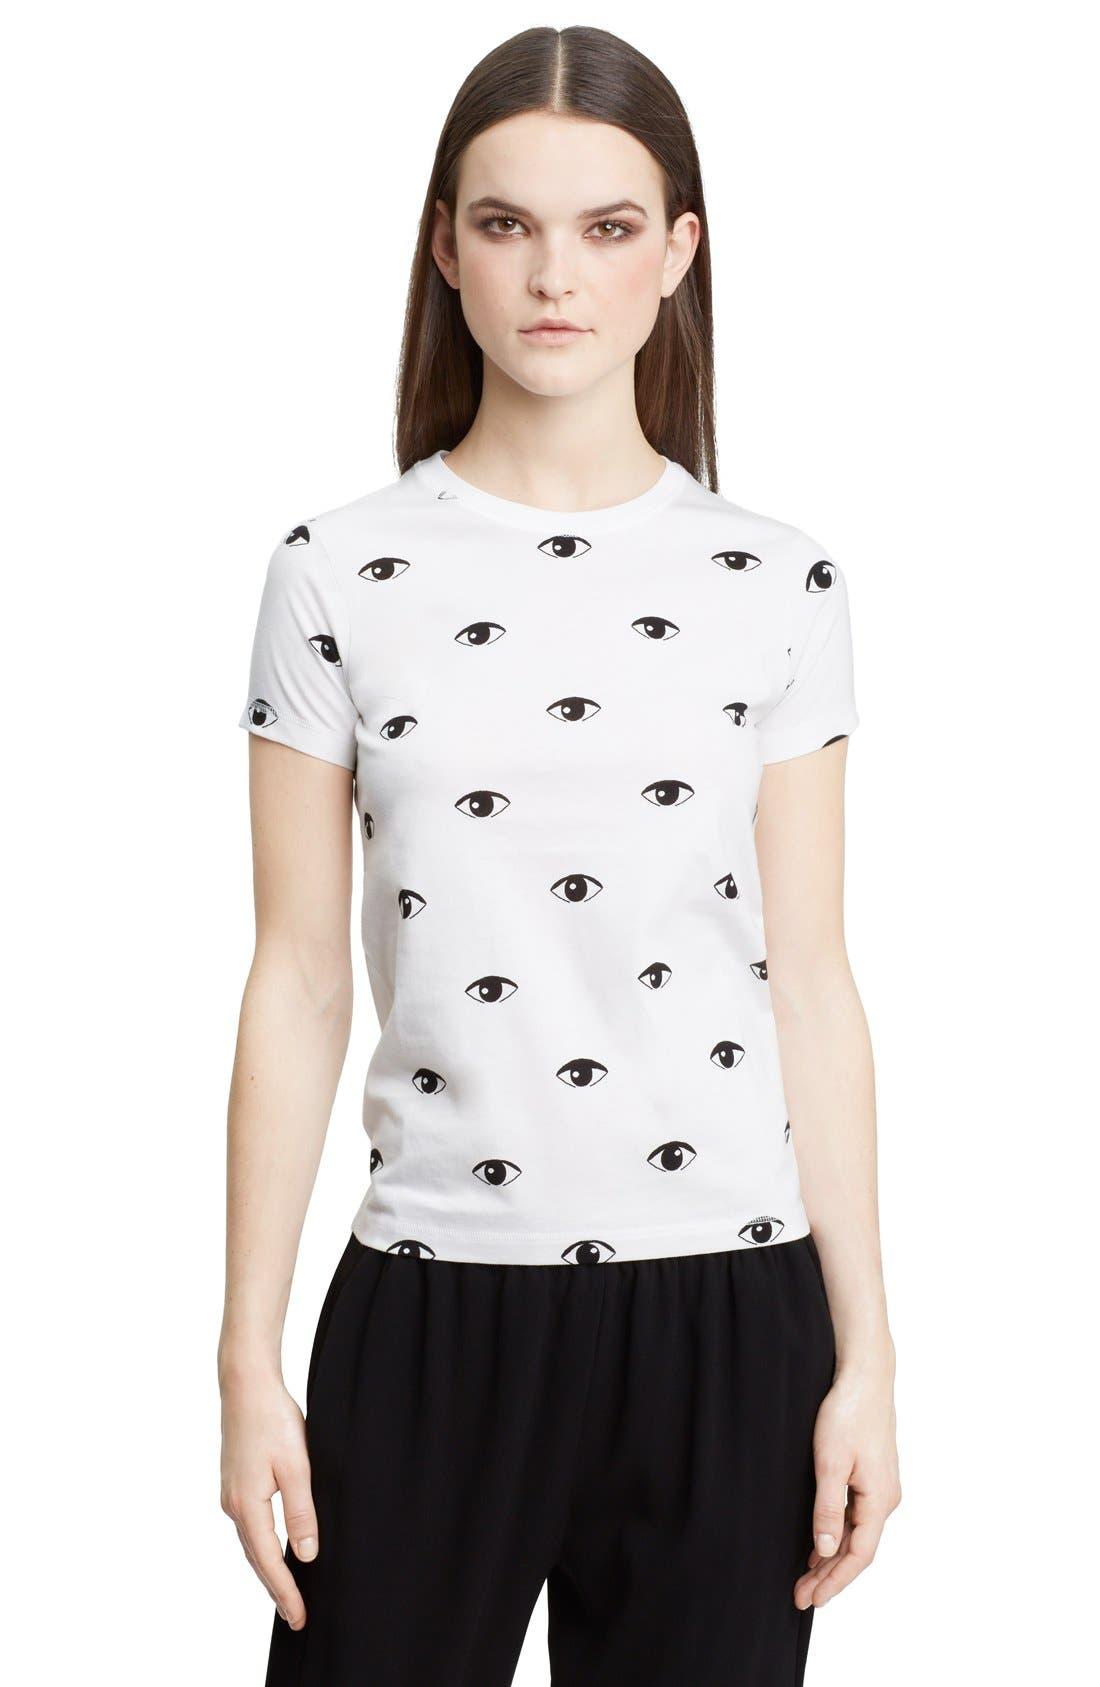 Alternate Image 1 Selected - KENZO Eye Print Cotton T-Shirt